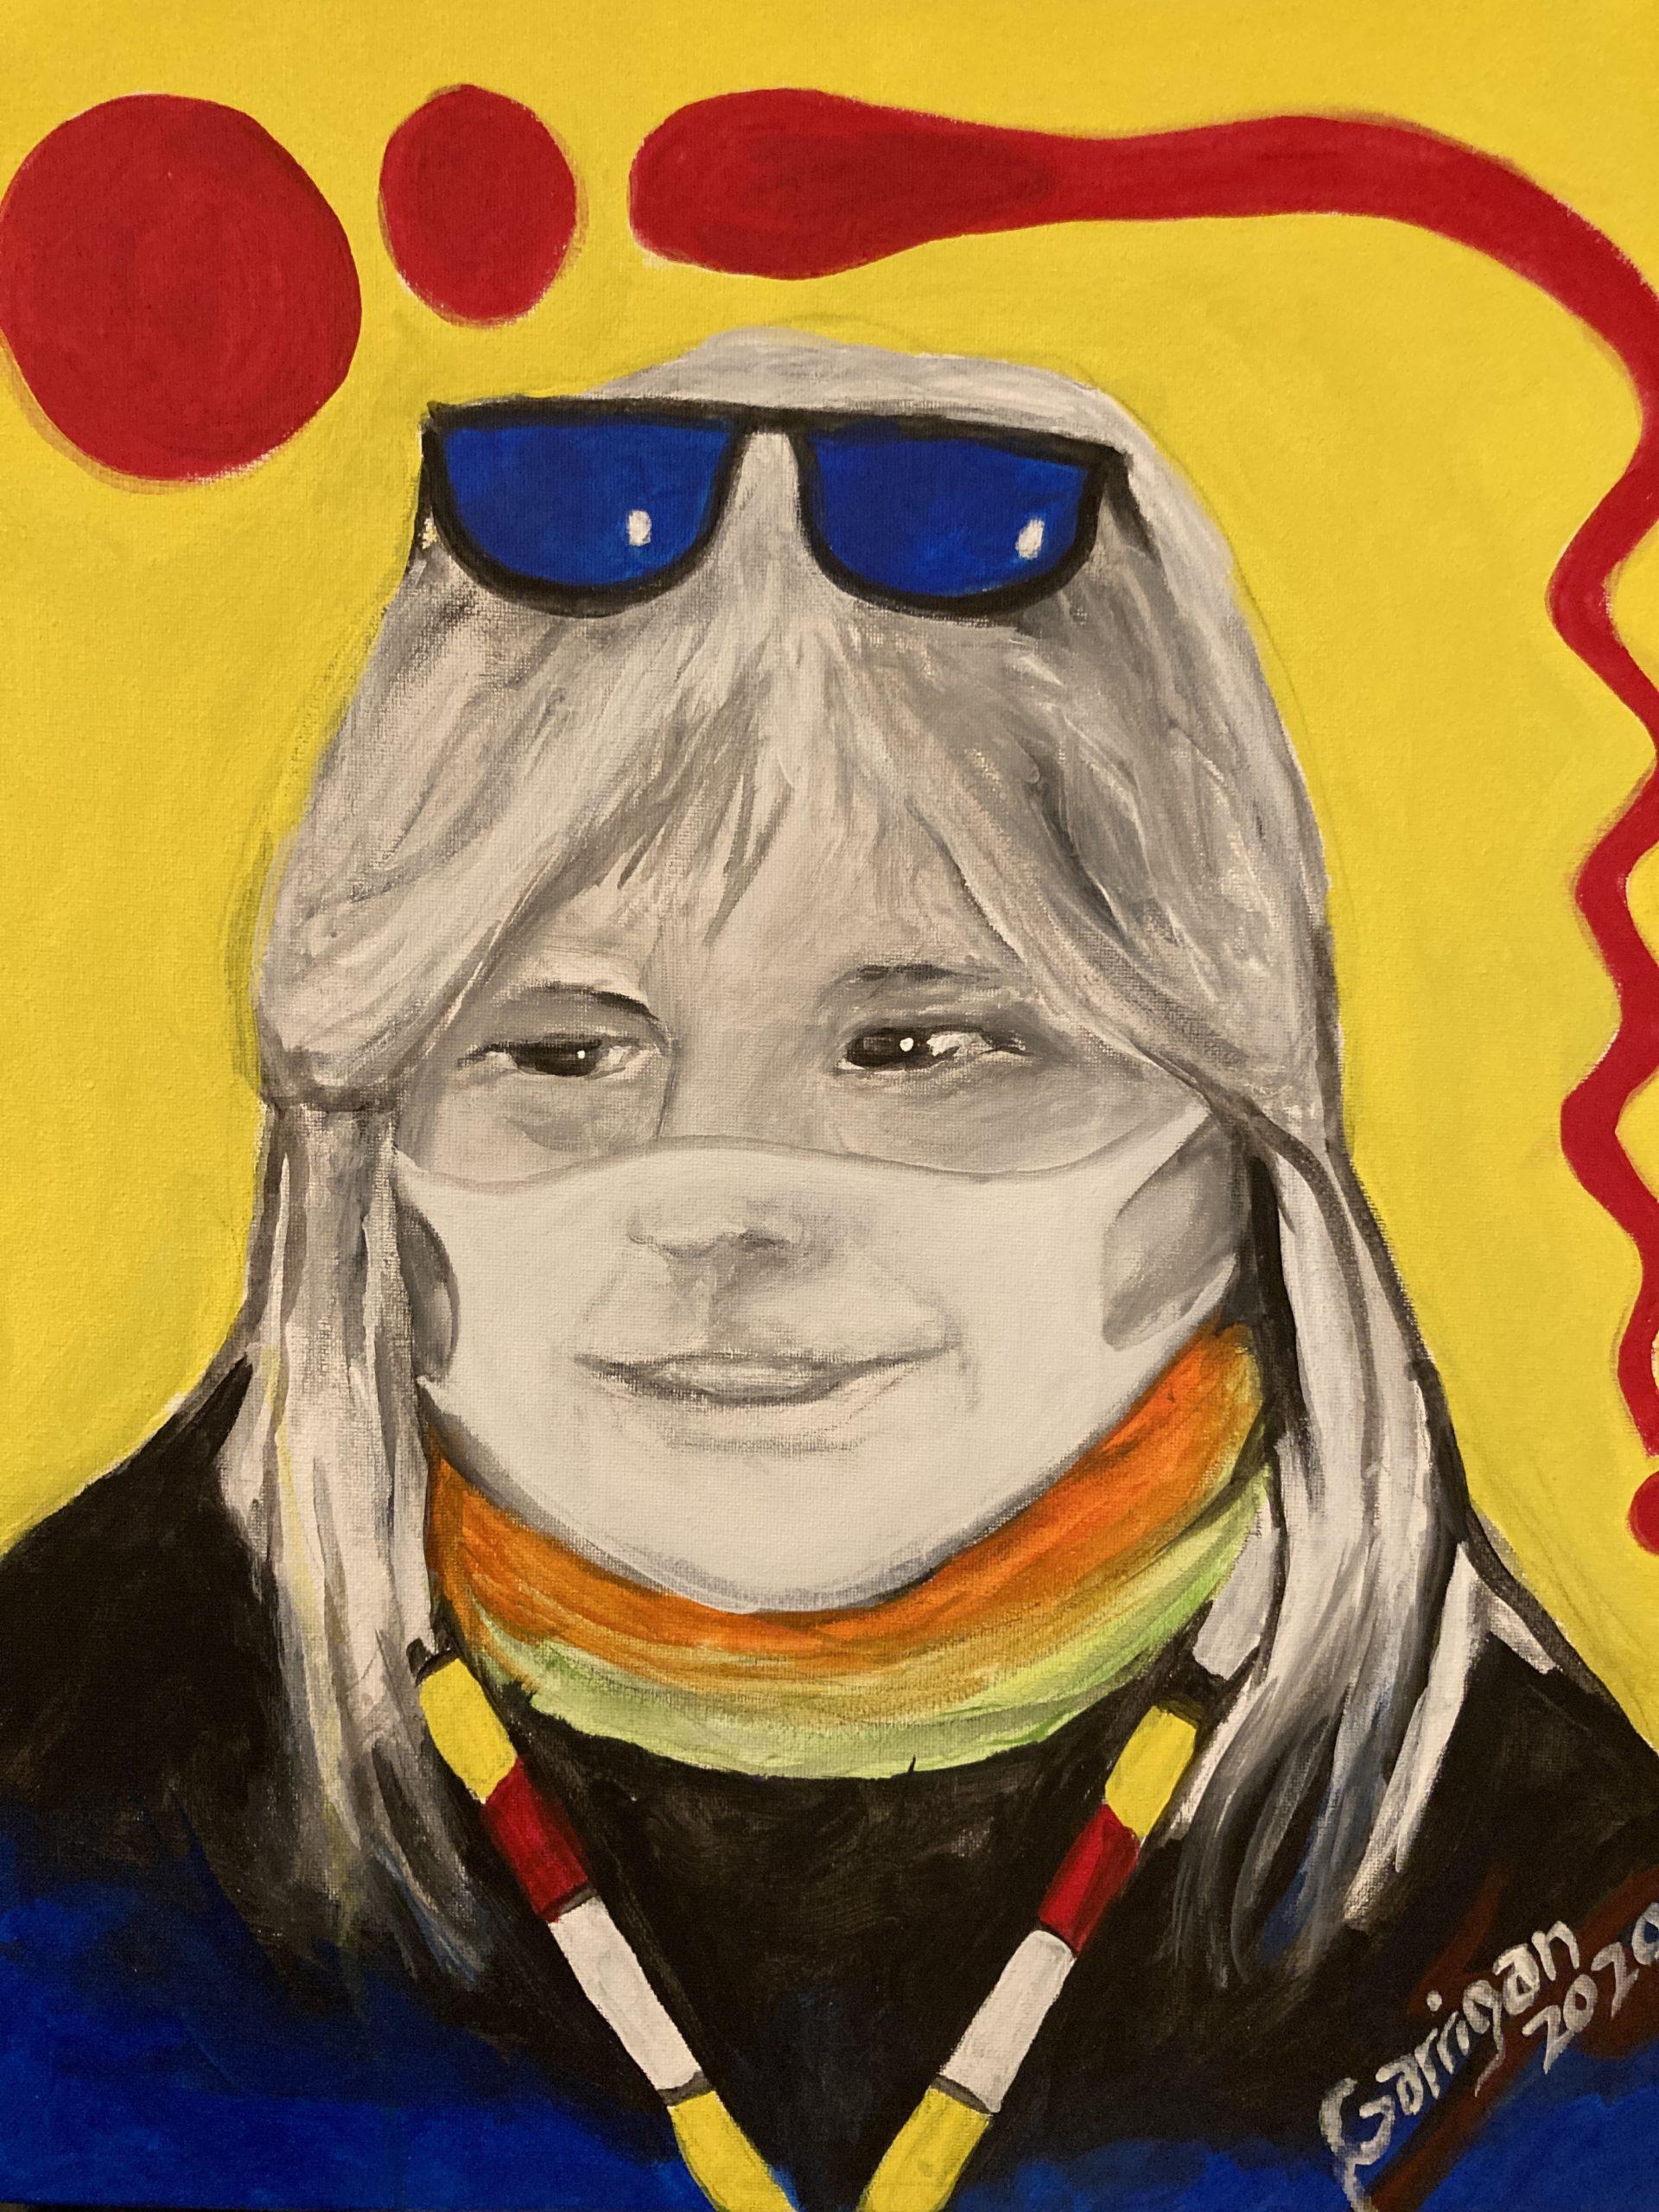 Self portraits study #2 2020 Garrigan